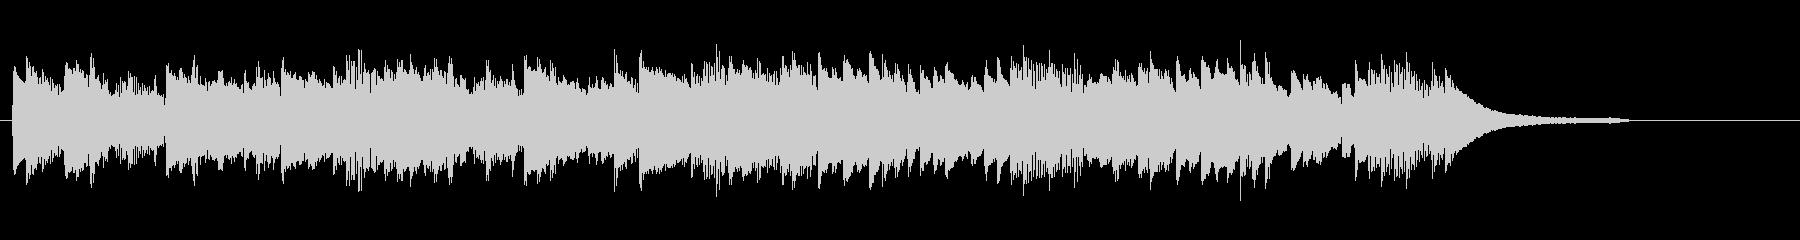 CM30秒、優しく感動的なピアノソロ15の未再生の波形